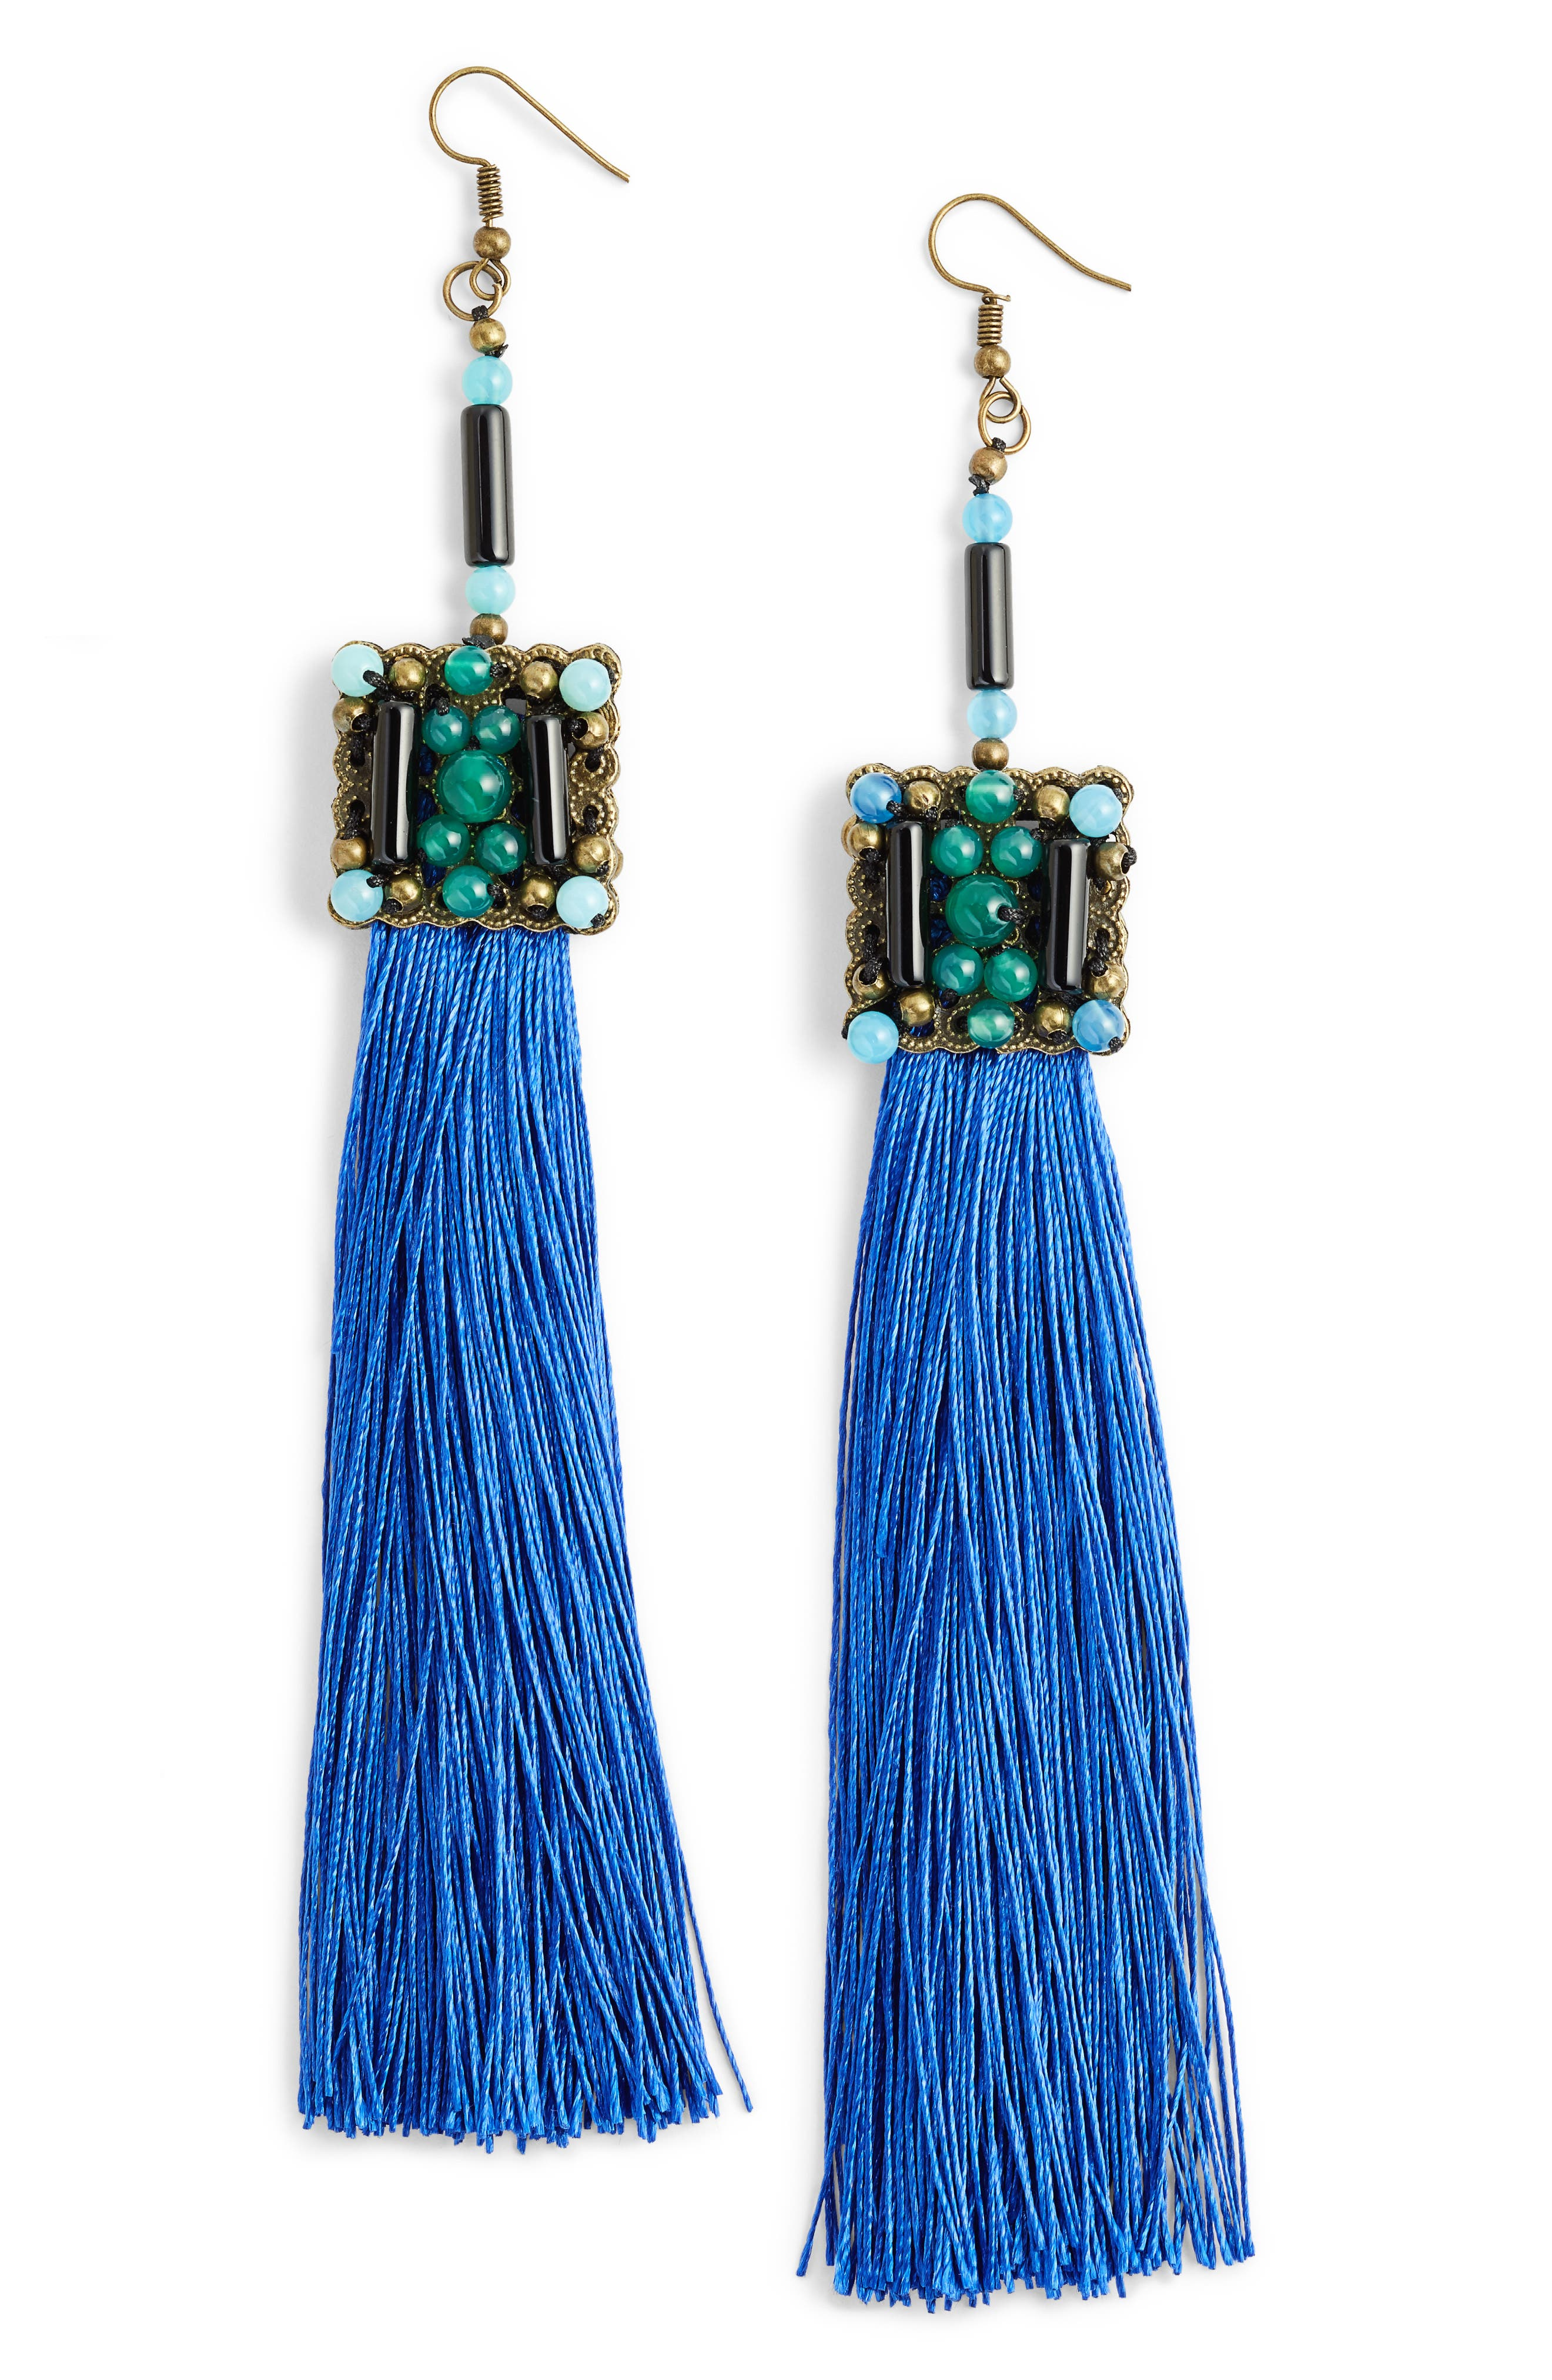 Blue Lagoon Jade Tassel Earrings,                             Main thumbnail 1, color,                             Blue